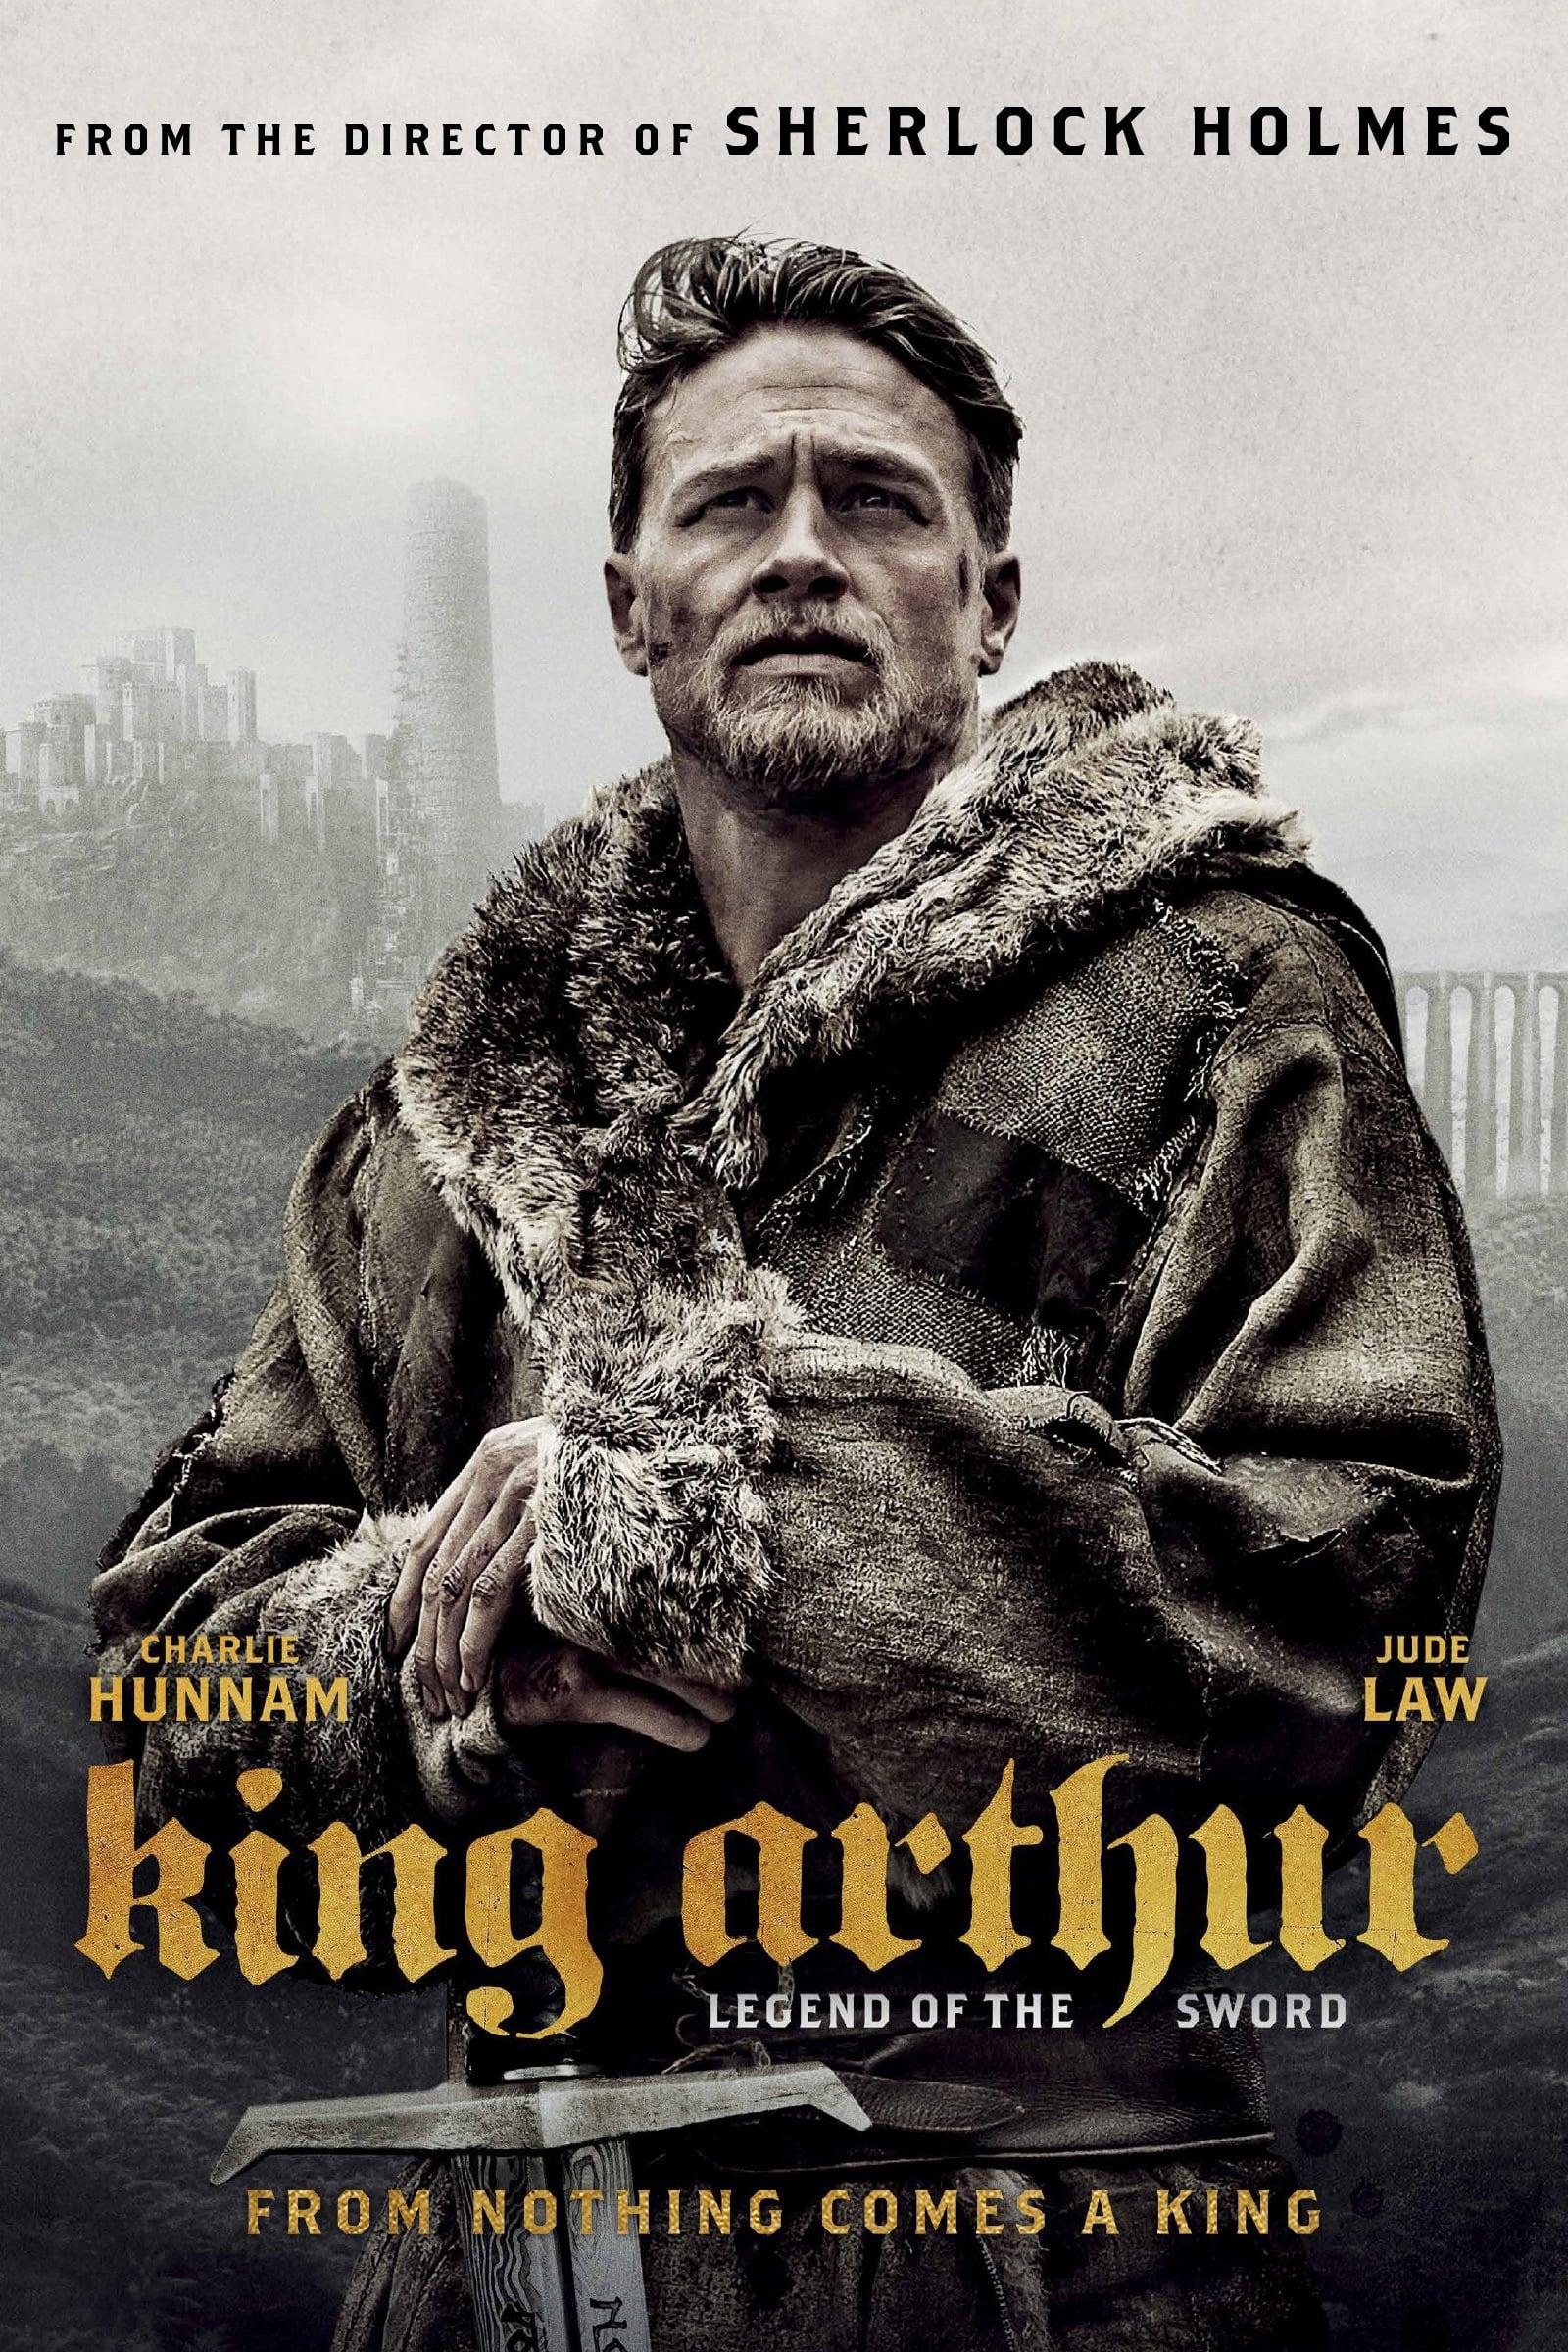 King Arthur Legend Of The Sword Trailer